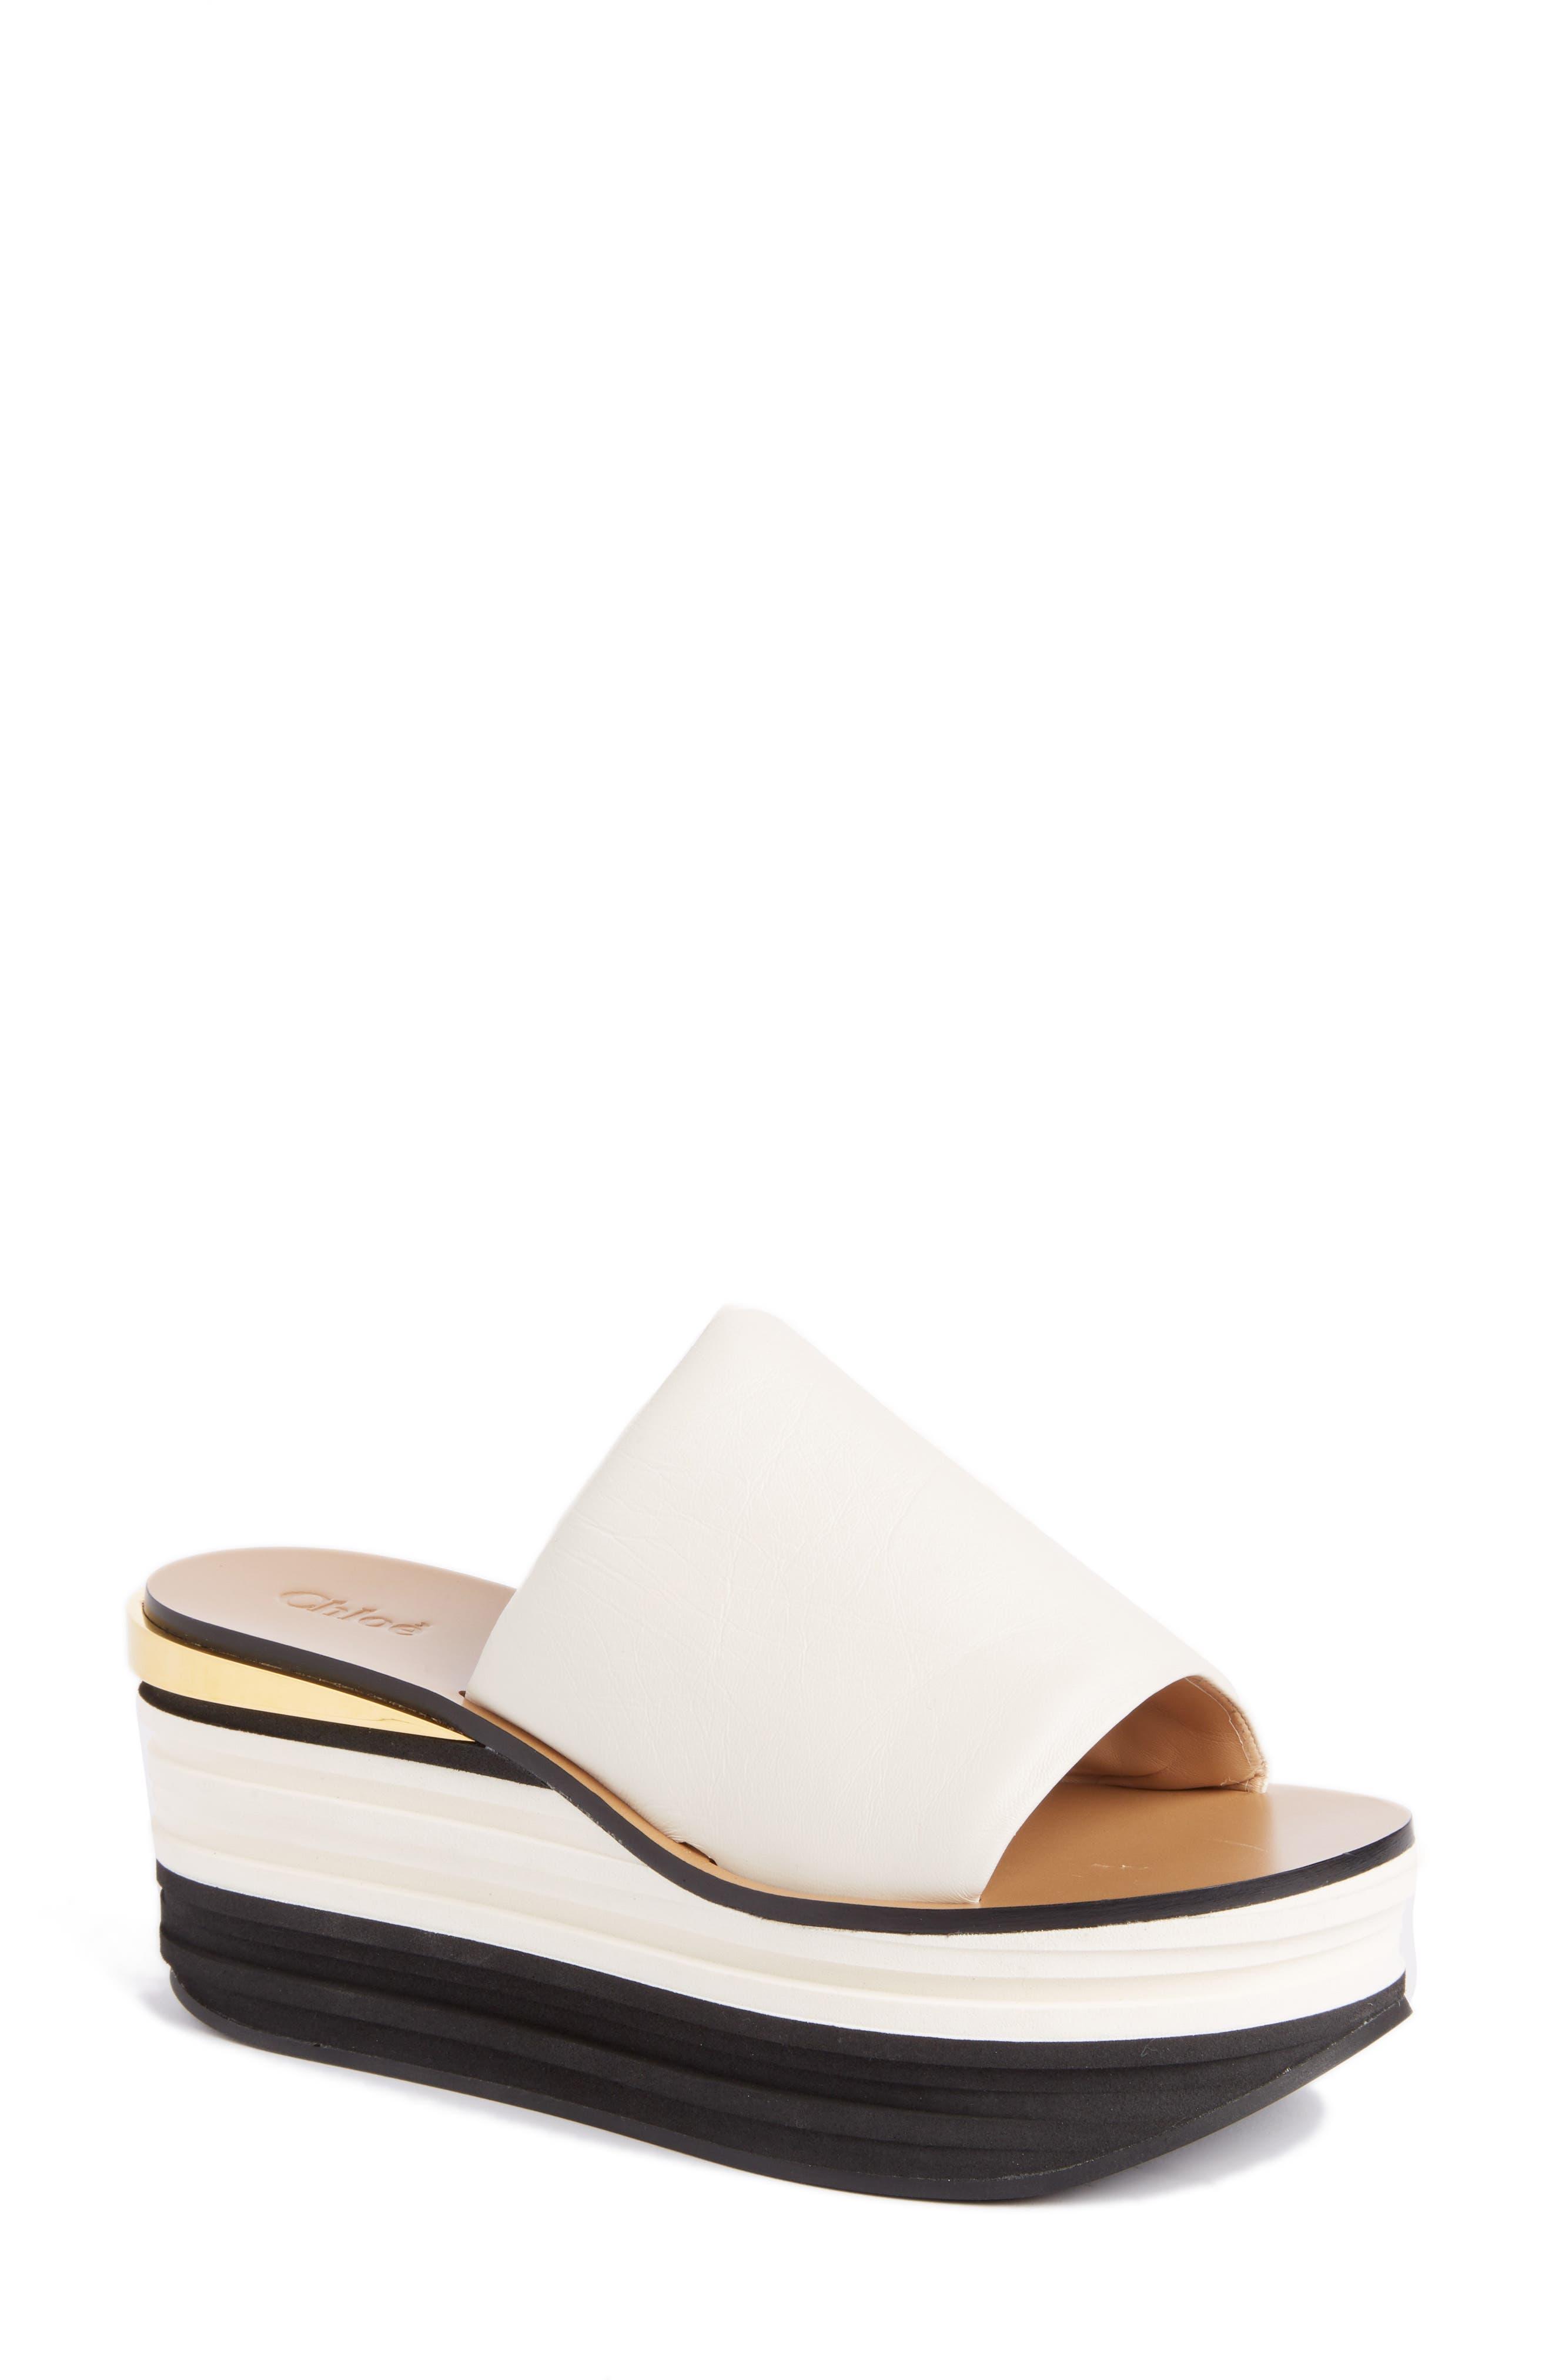 Camille Platform Sandal,                         Main,                         color, WHITE